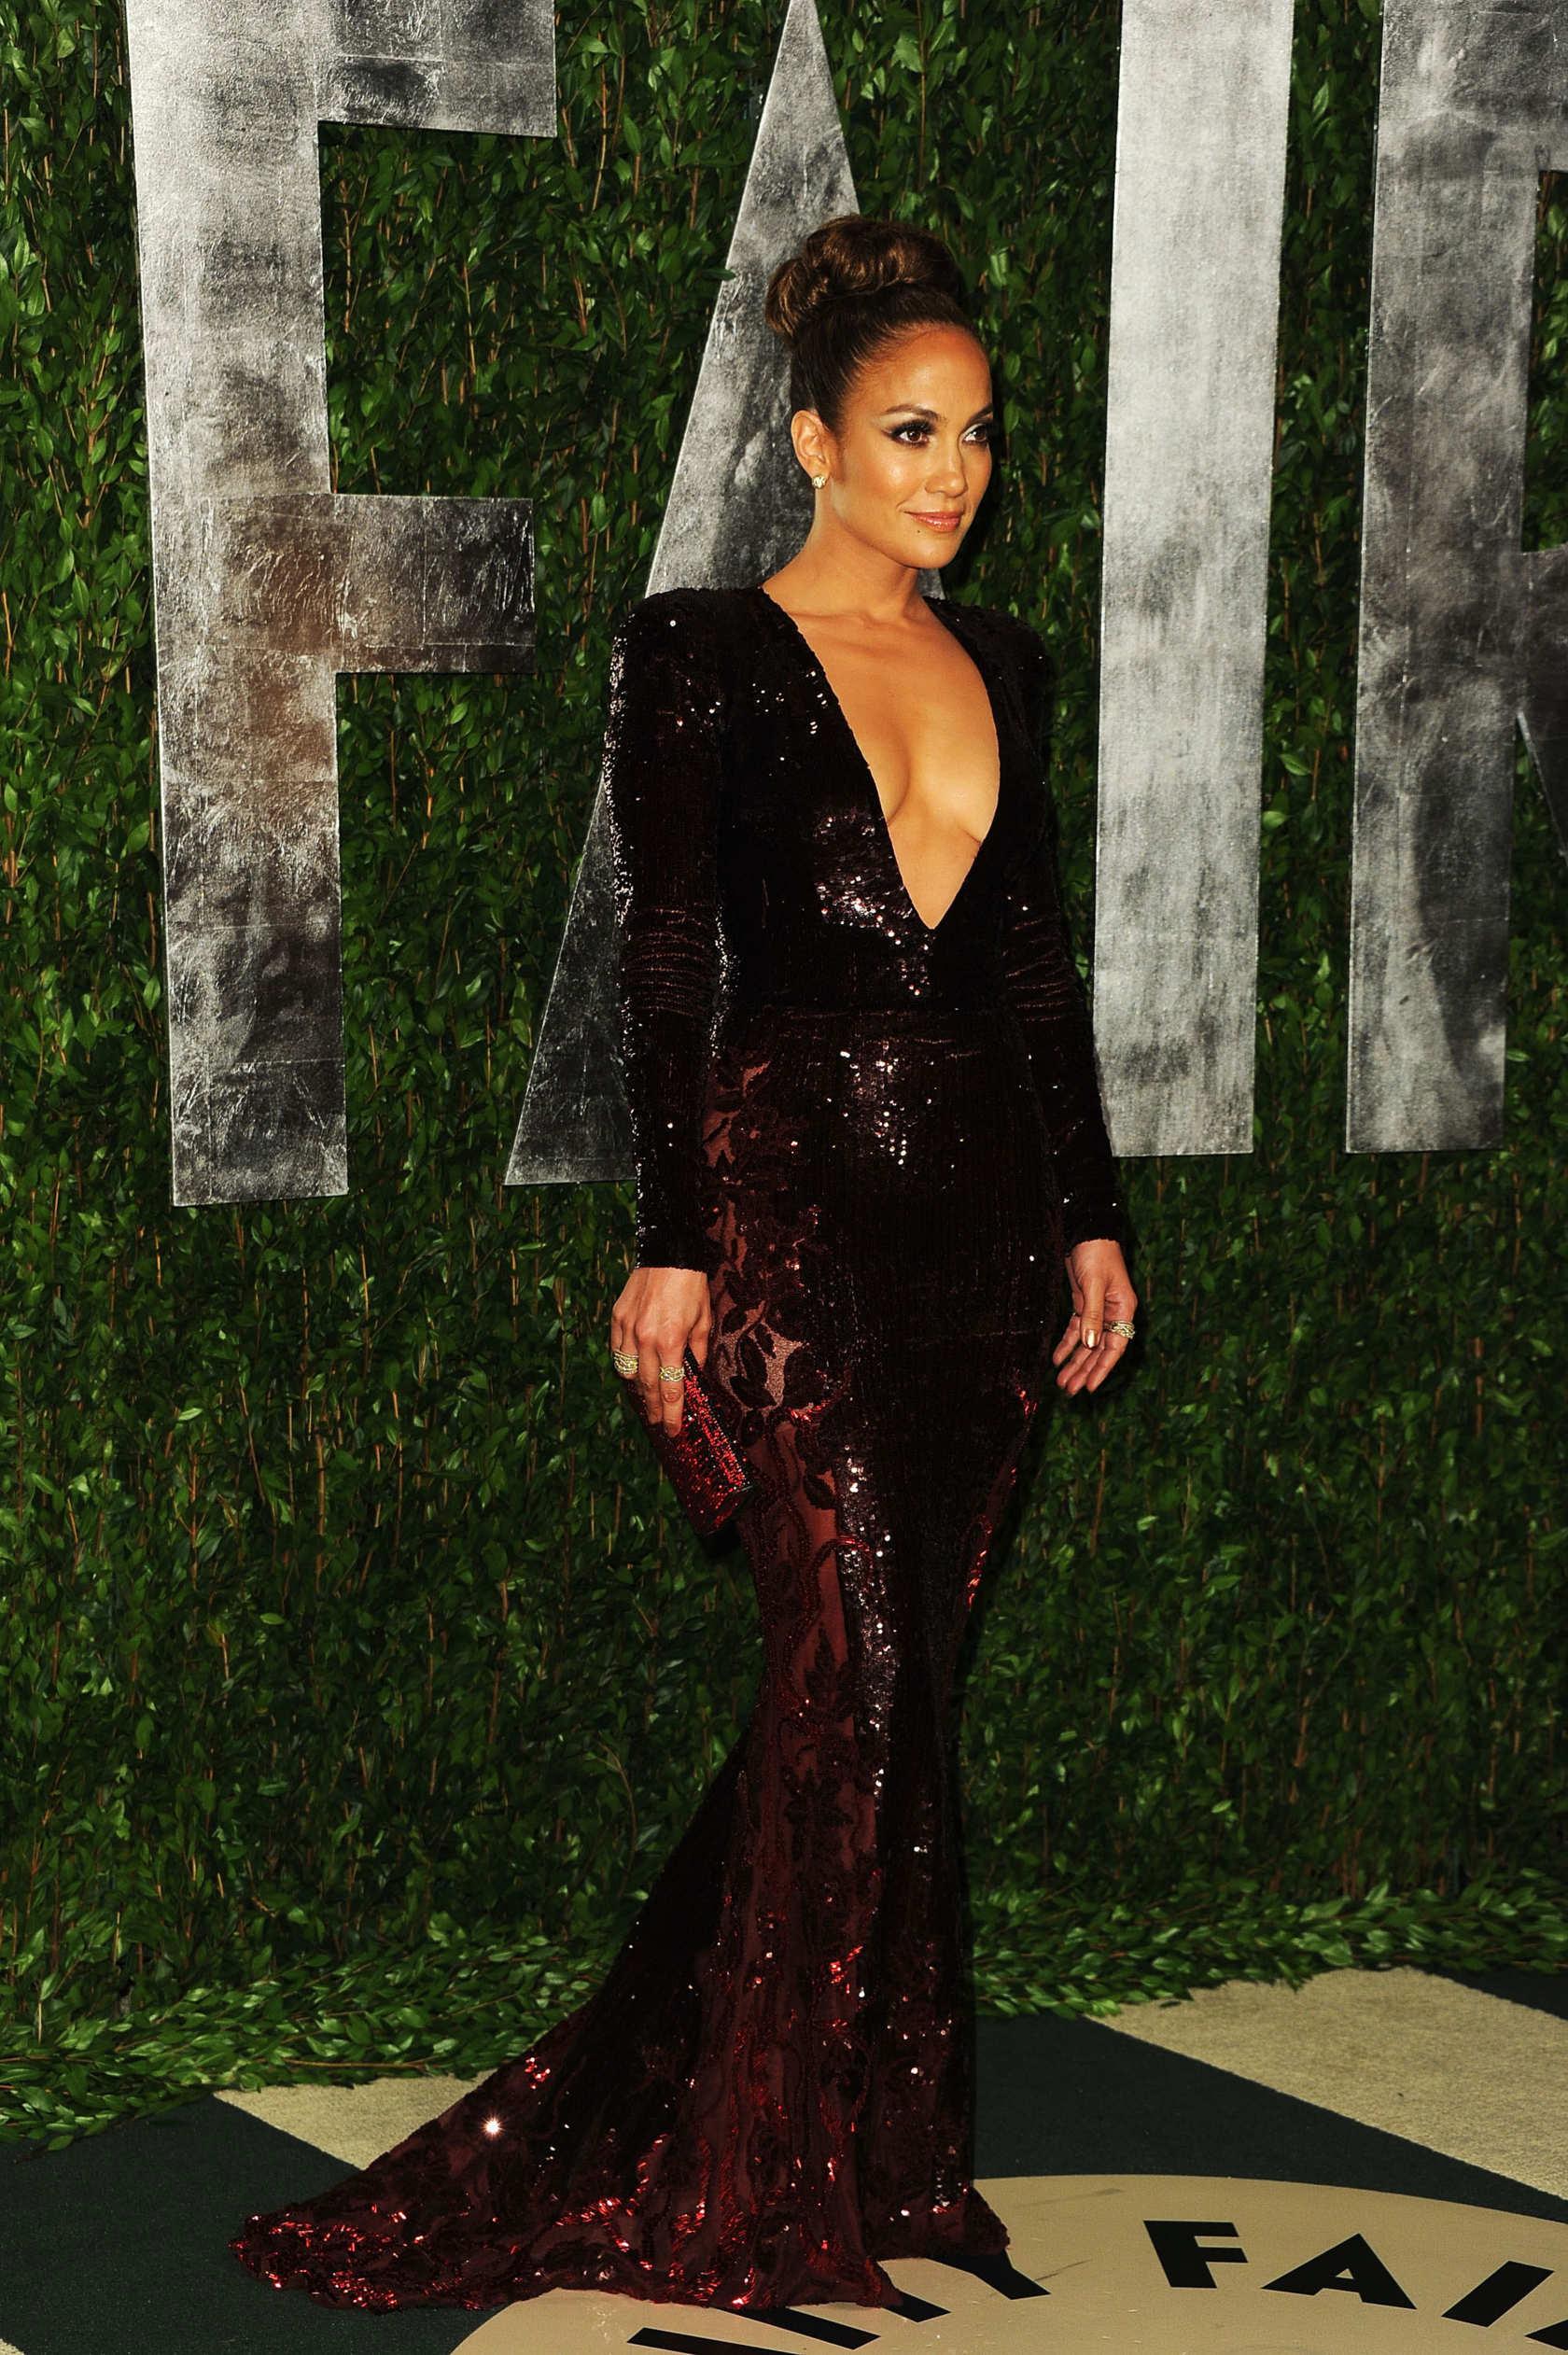 Jennifer Lopez at the Vanity Fair Oscars Party - Fug Girls - The Cut